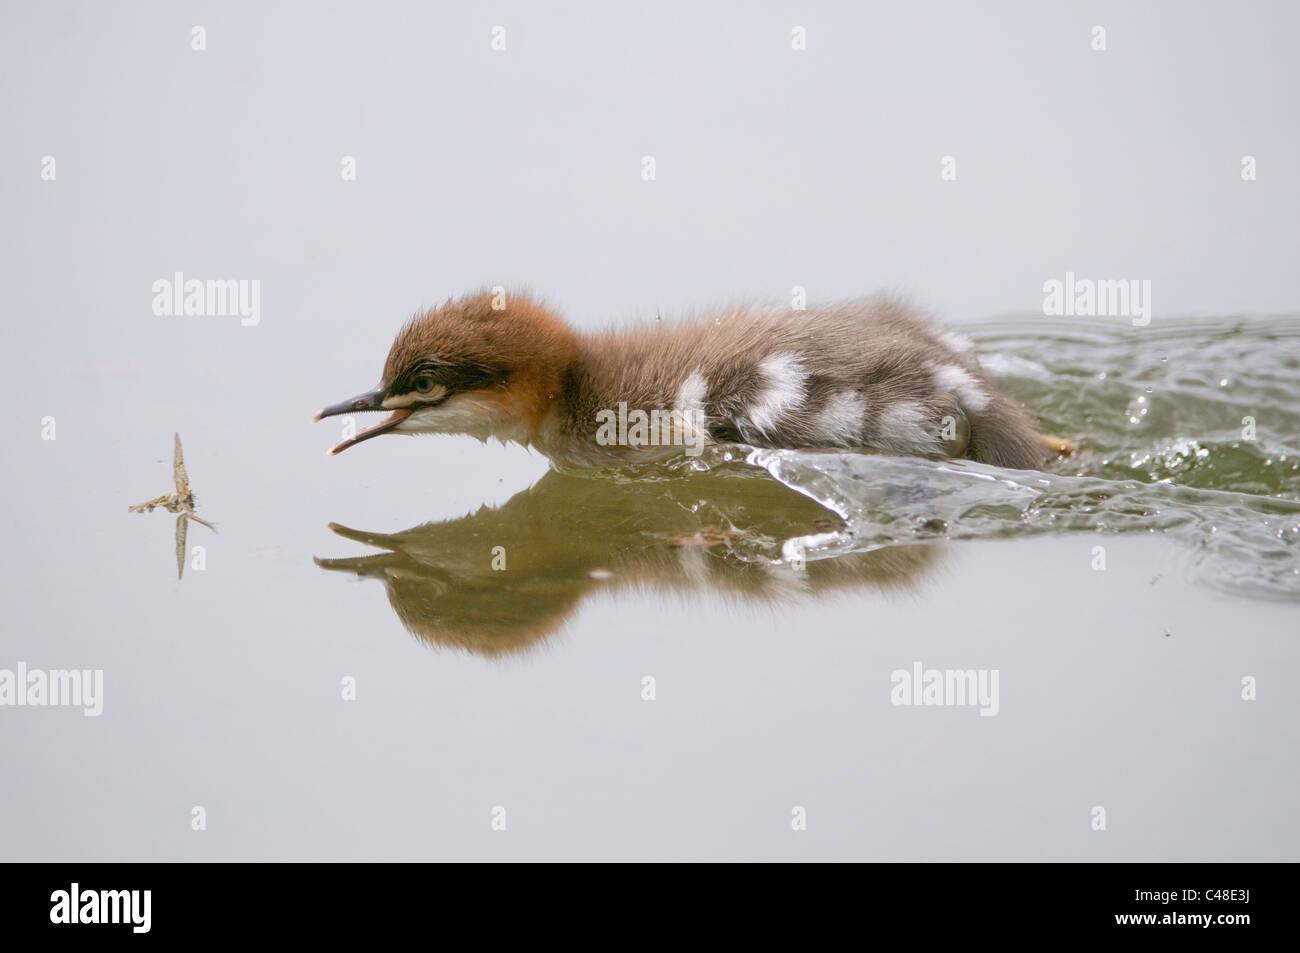 Gaensesaeger, Kueken schnappt eine Eintagsfliege, Mergus merganser, Common Merganser, snapping dayfly, Deutschland, - Stock Image